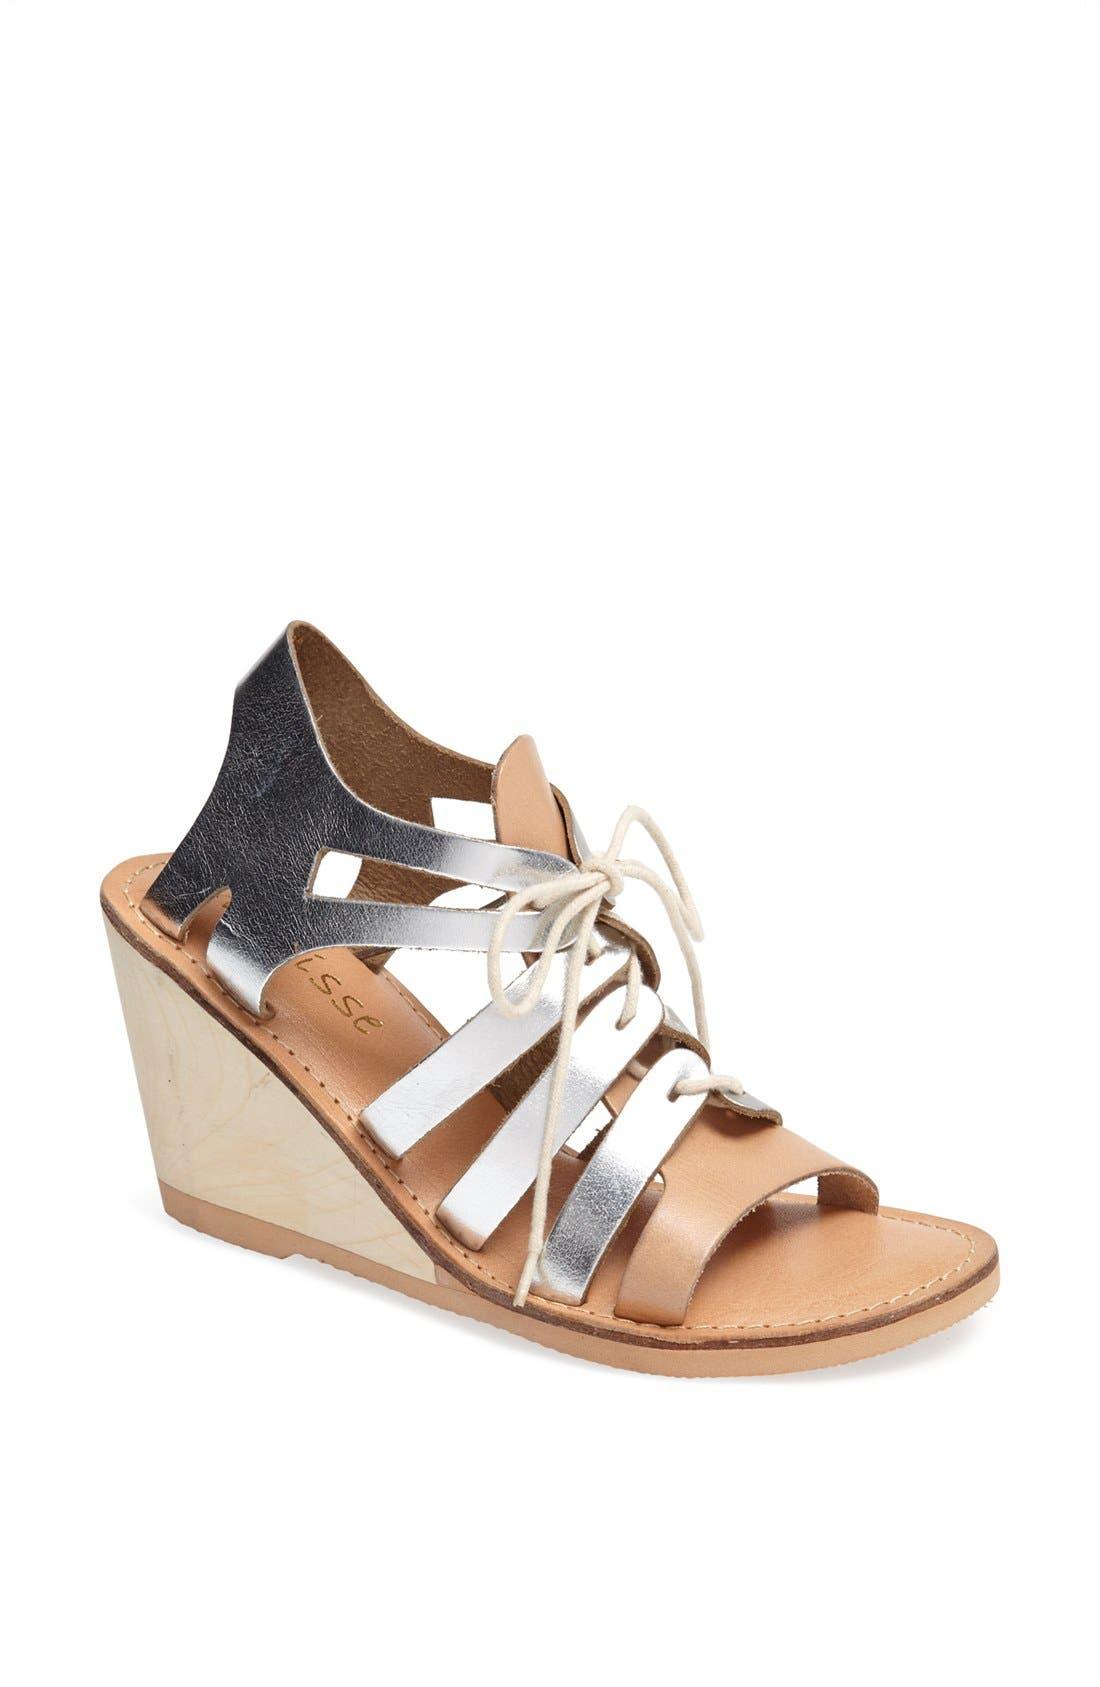 Alternate Image 1 Selected - Matisse 'Begin' Metallic Leather Wedge Sandal